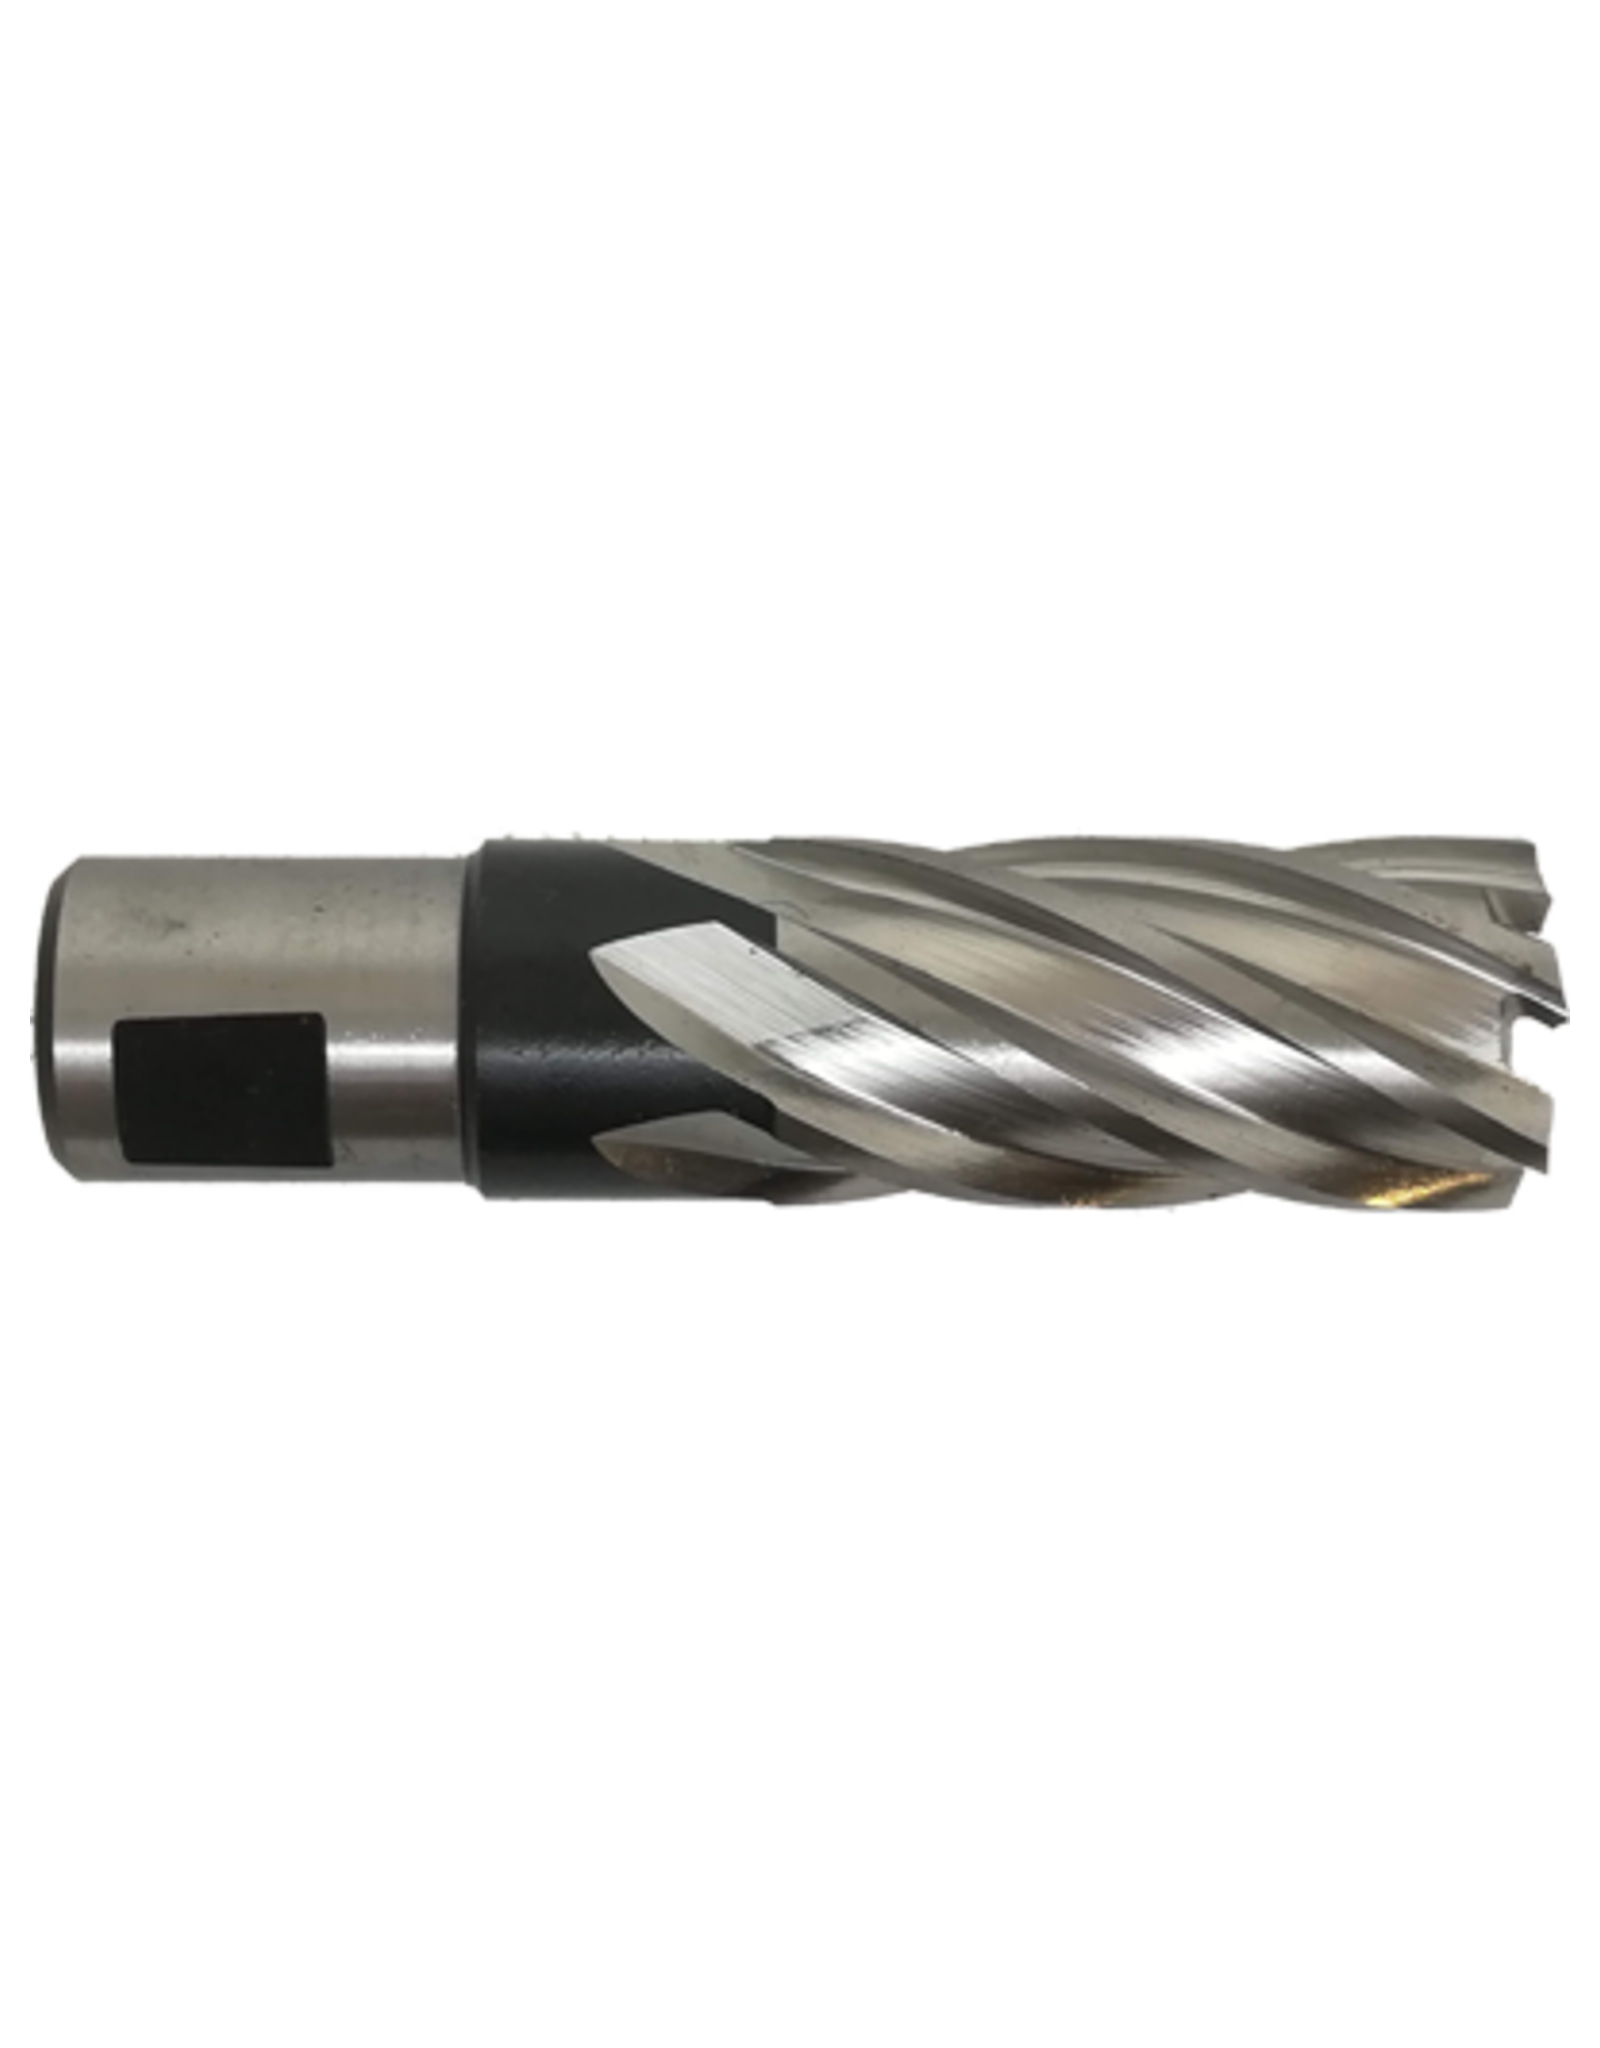 Evolution Power Tools Steel Line EVOLUTION CORE CUTTER LONG - 28 MM